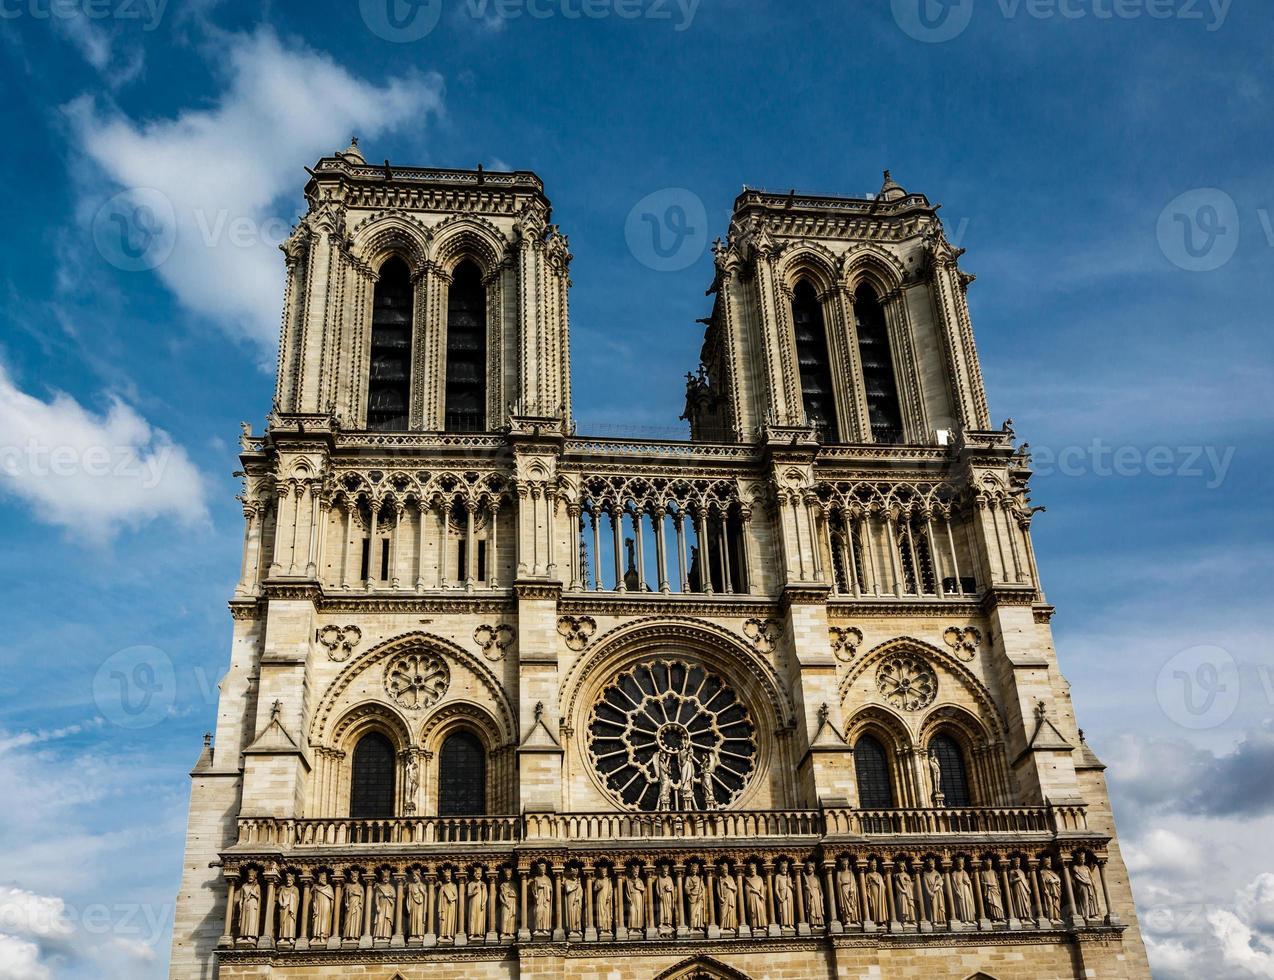 Cattedrale di Notre Dame de Paris sull'isola di Cité, Francia foto